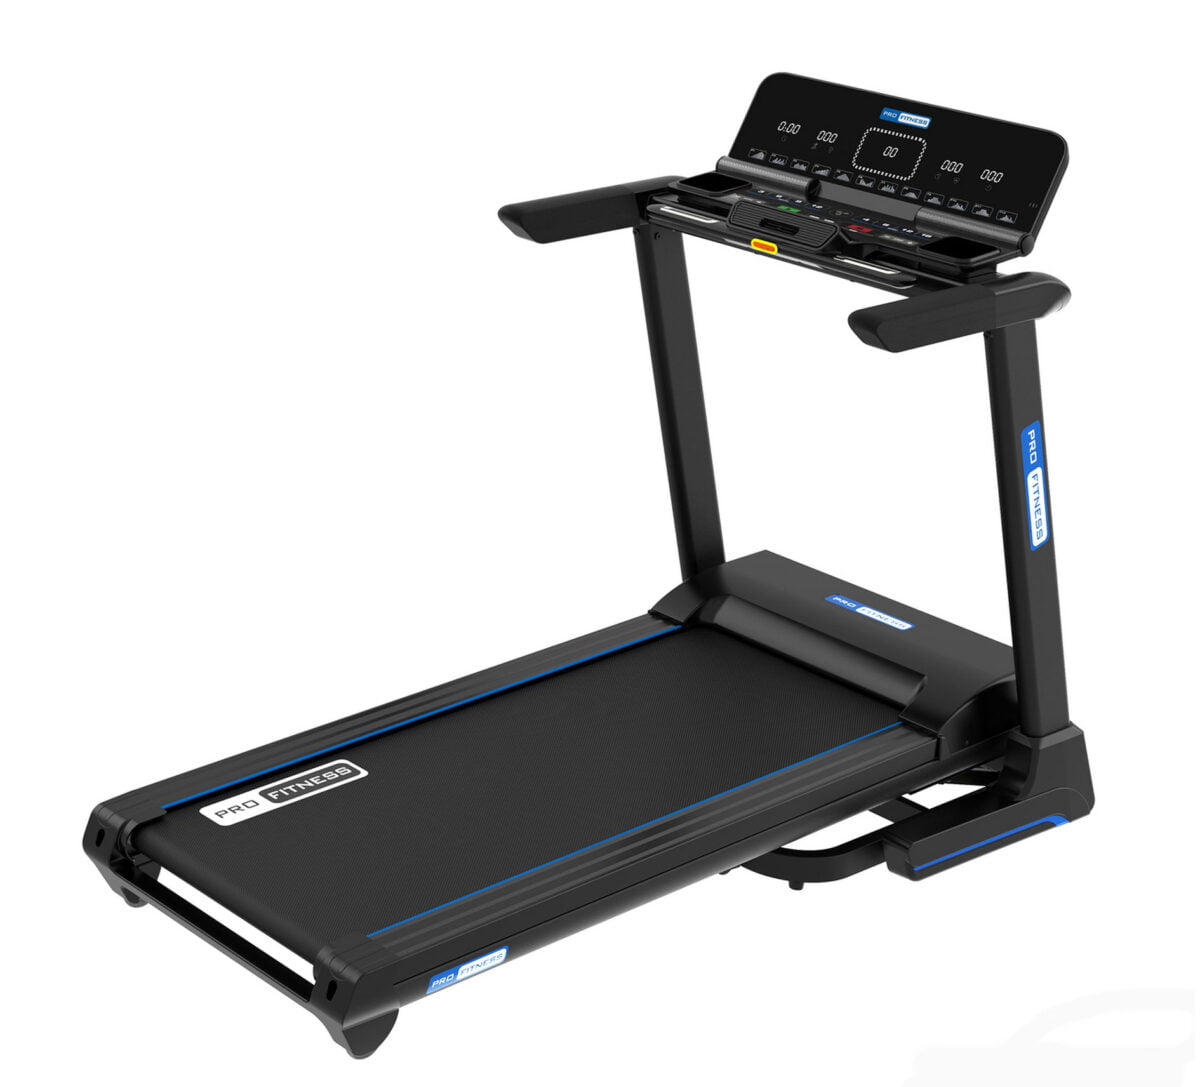 Pro Fitness T3000 review voucher code